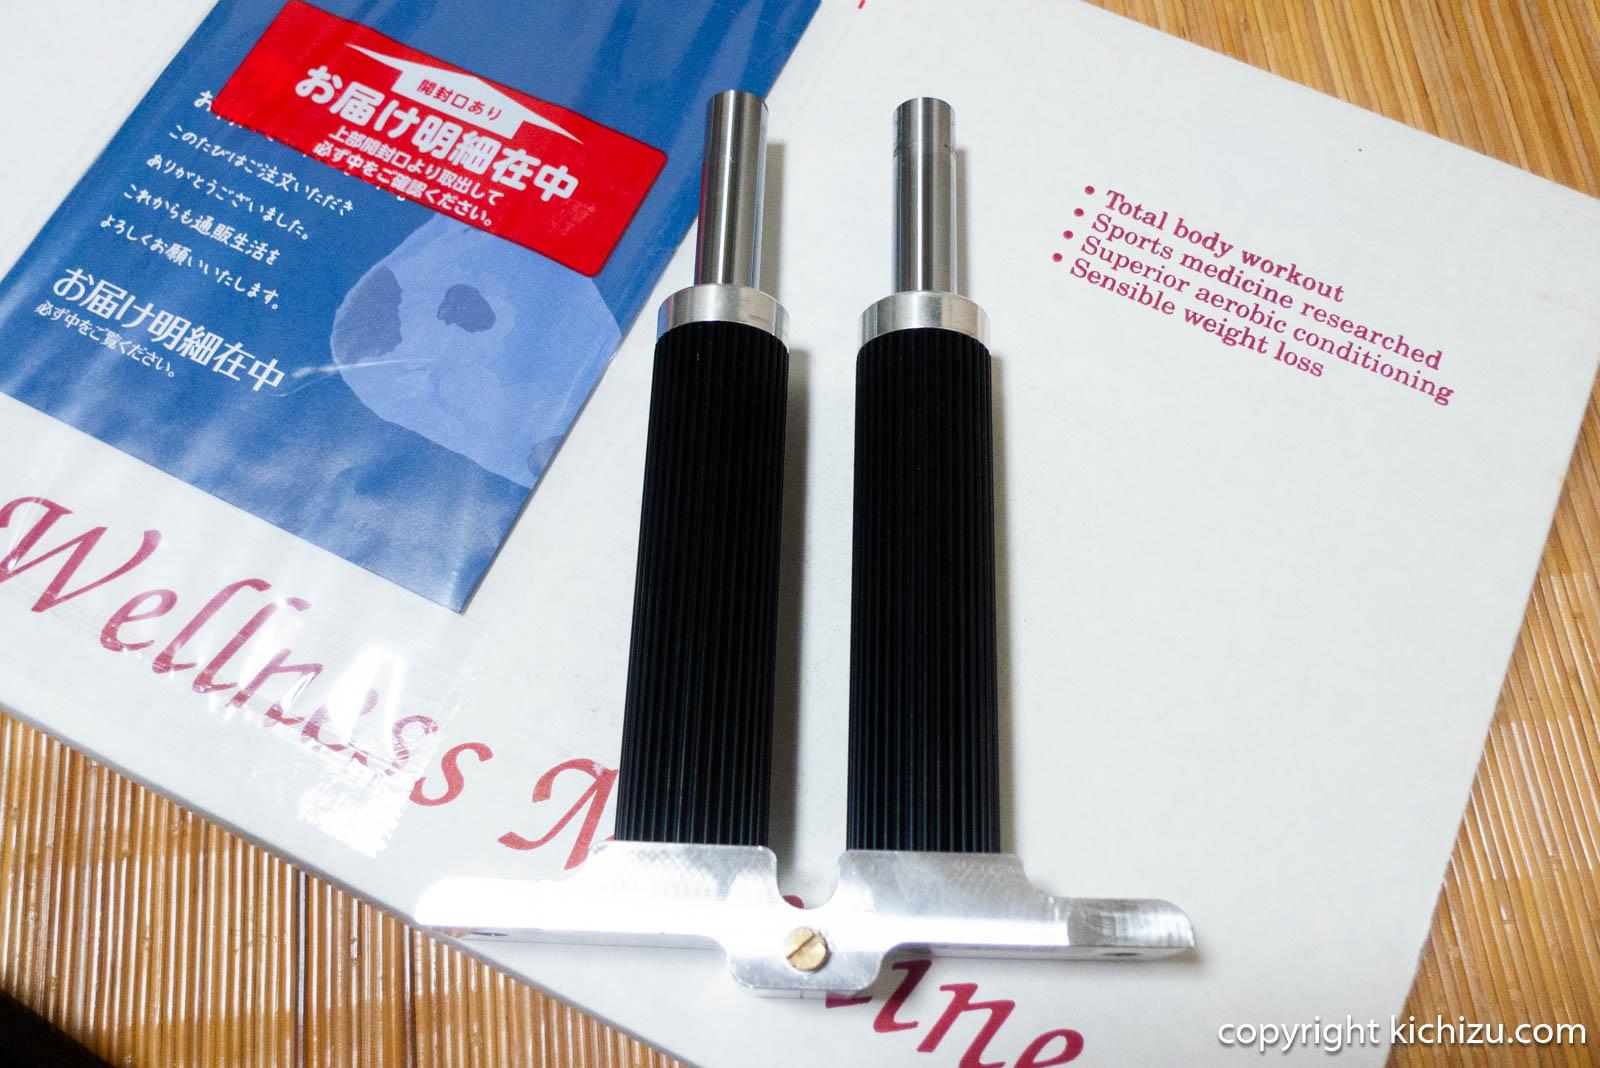 Xiser(エクサー)のステッパーの油圧シリンダー